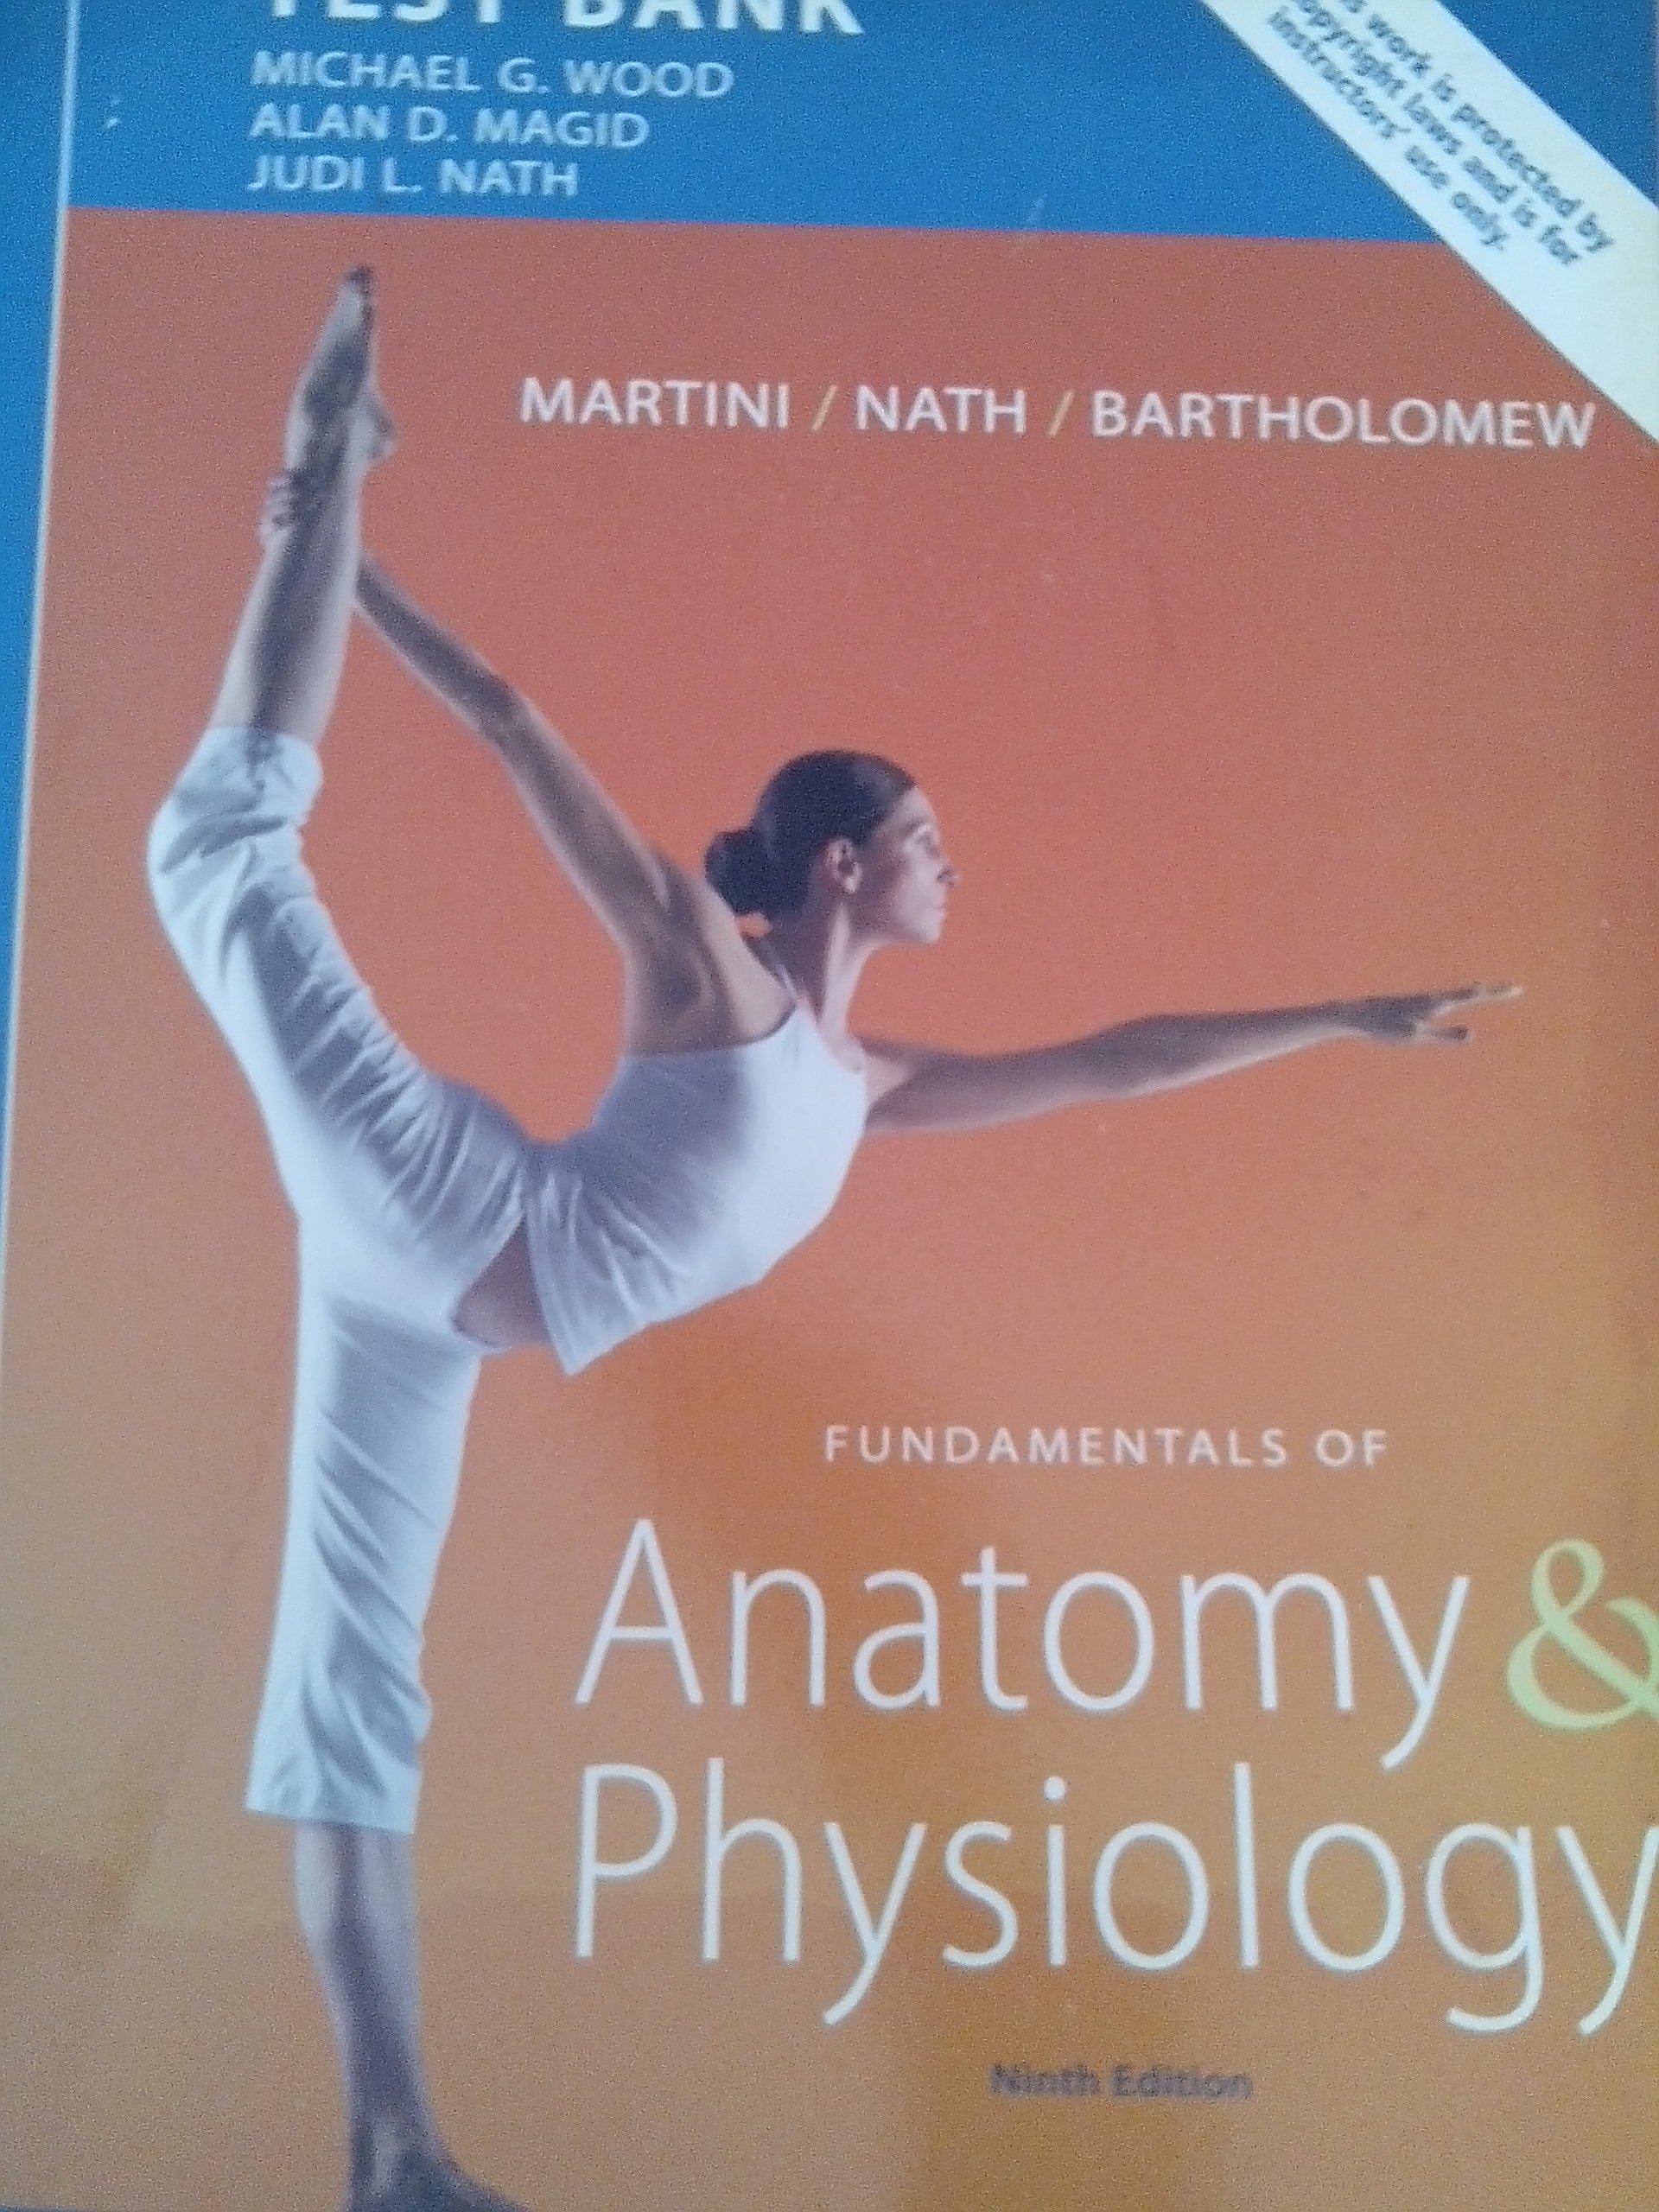 Fundamentals of Anatomy & Physiology Test Bank (Martini): Judi L ...